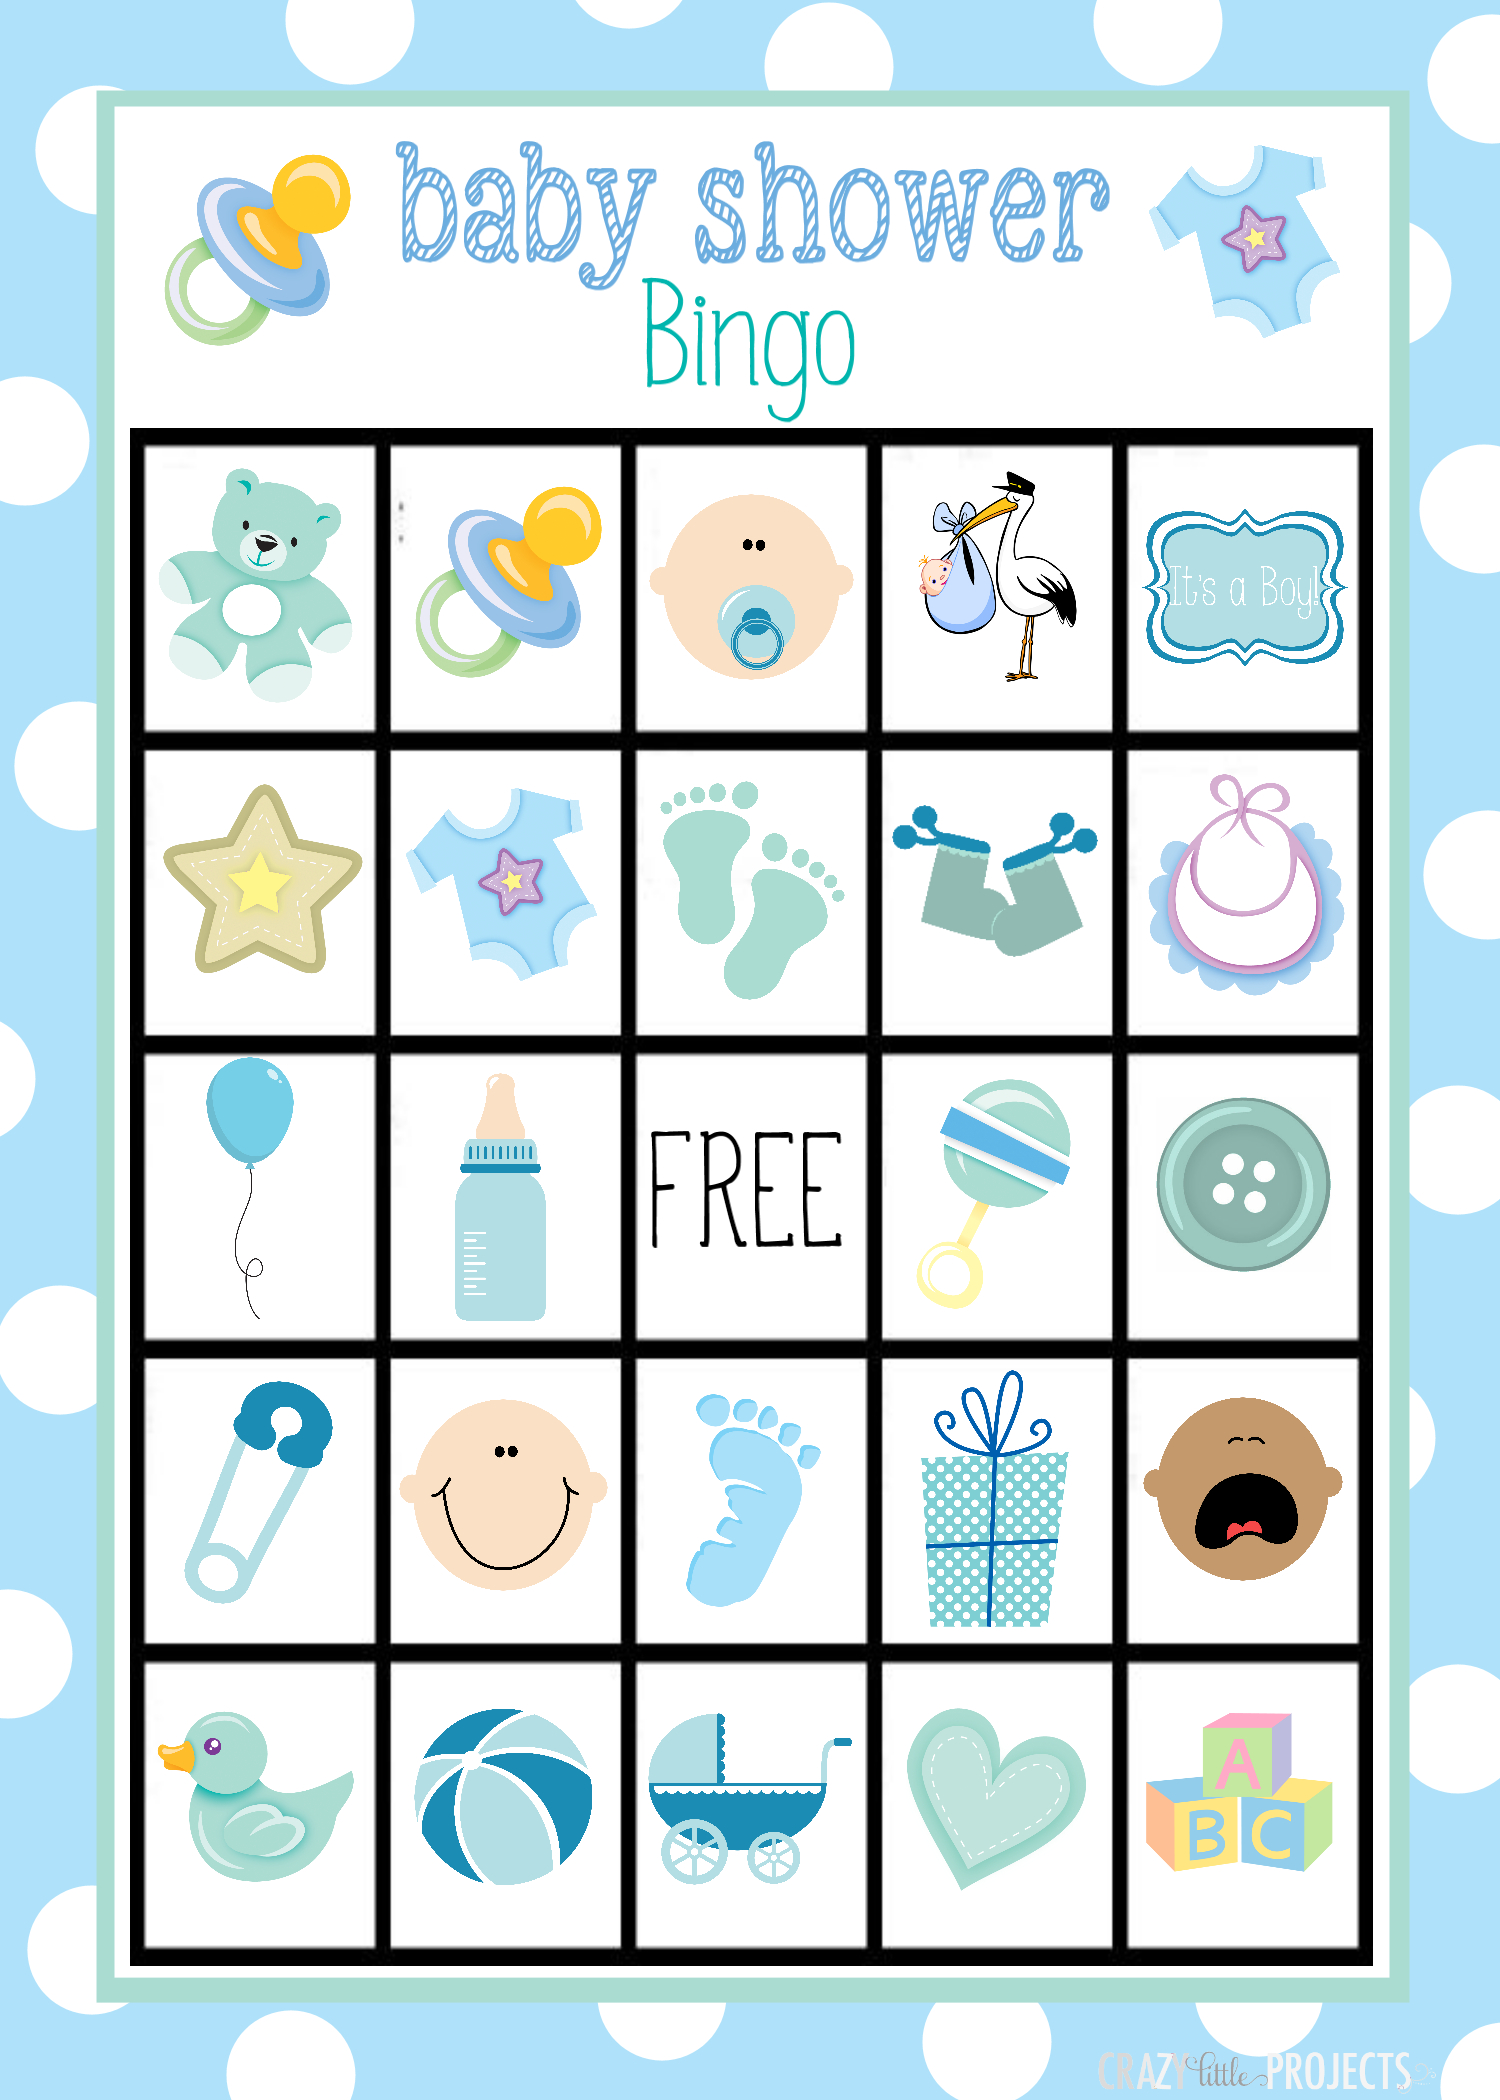 Baby Shower Bingo Cards - Free Printable Baby Boy Cards